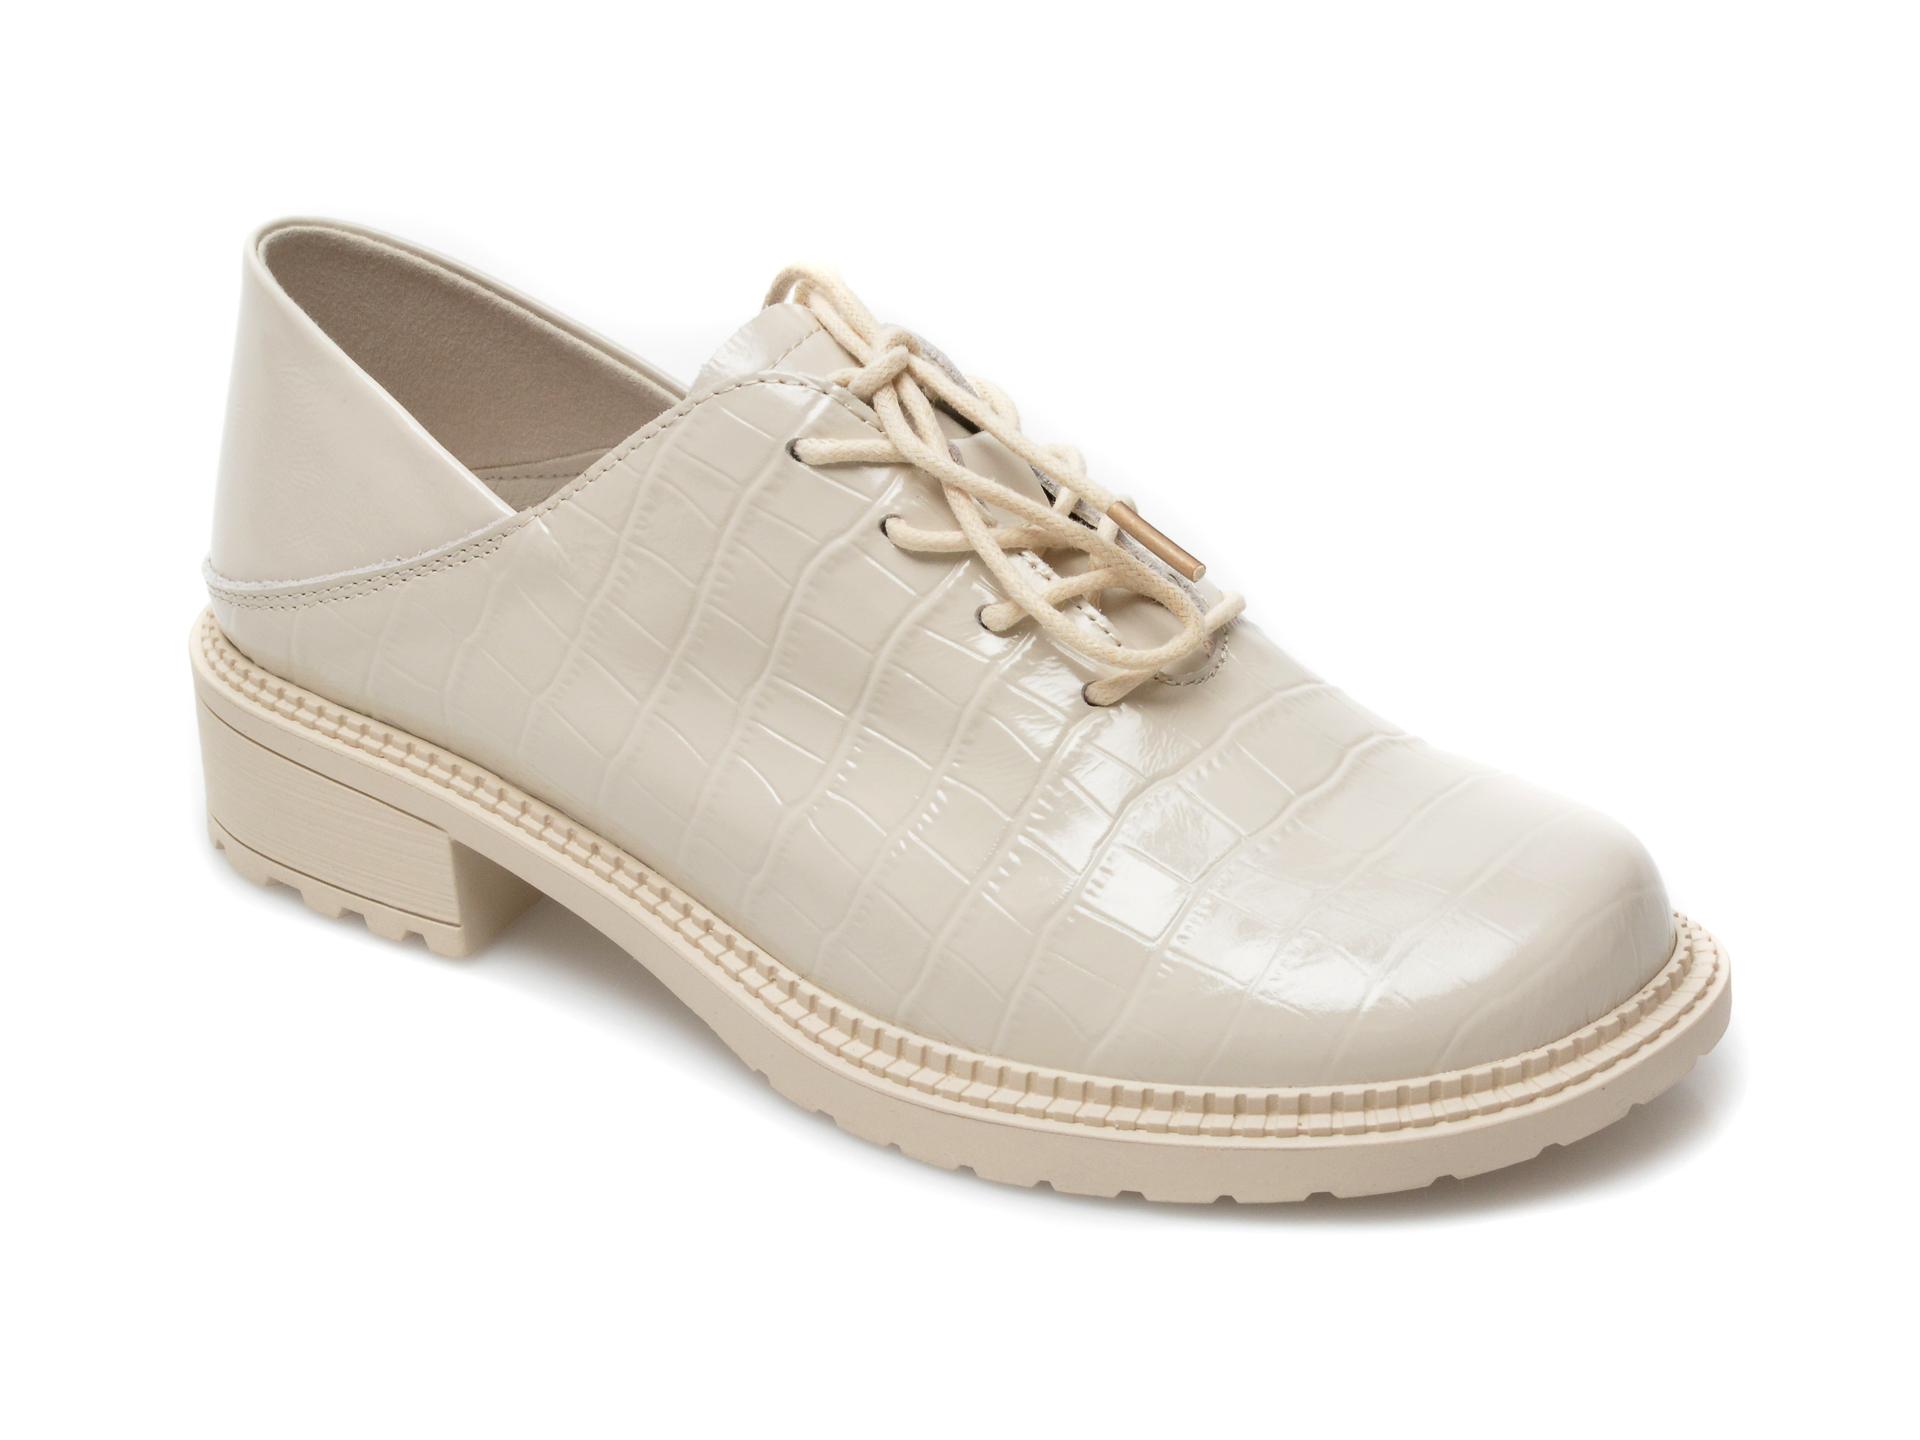 Pantofi GRYXX albi, Z018, din piele naturala lacuita imagine otter.ro 2021